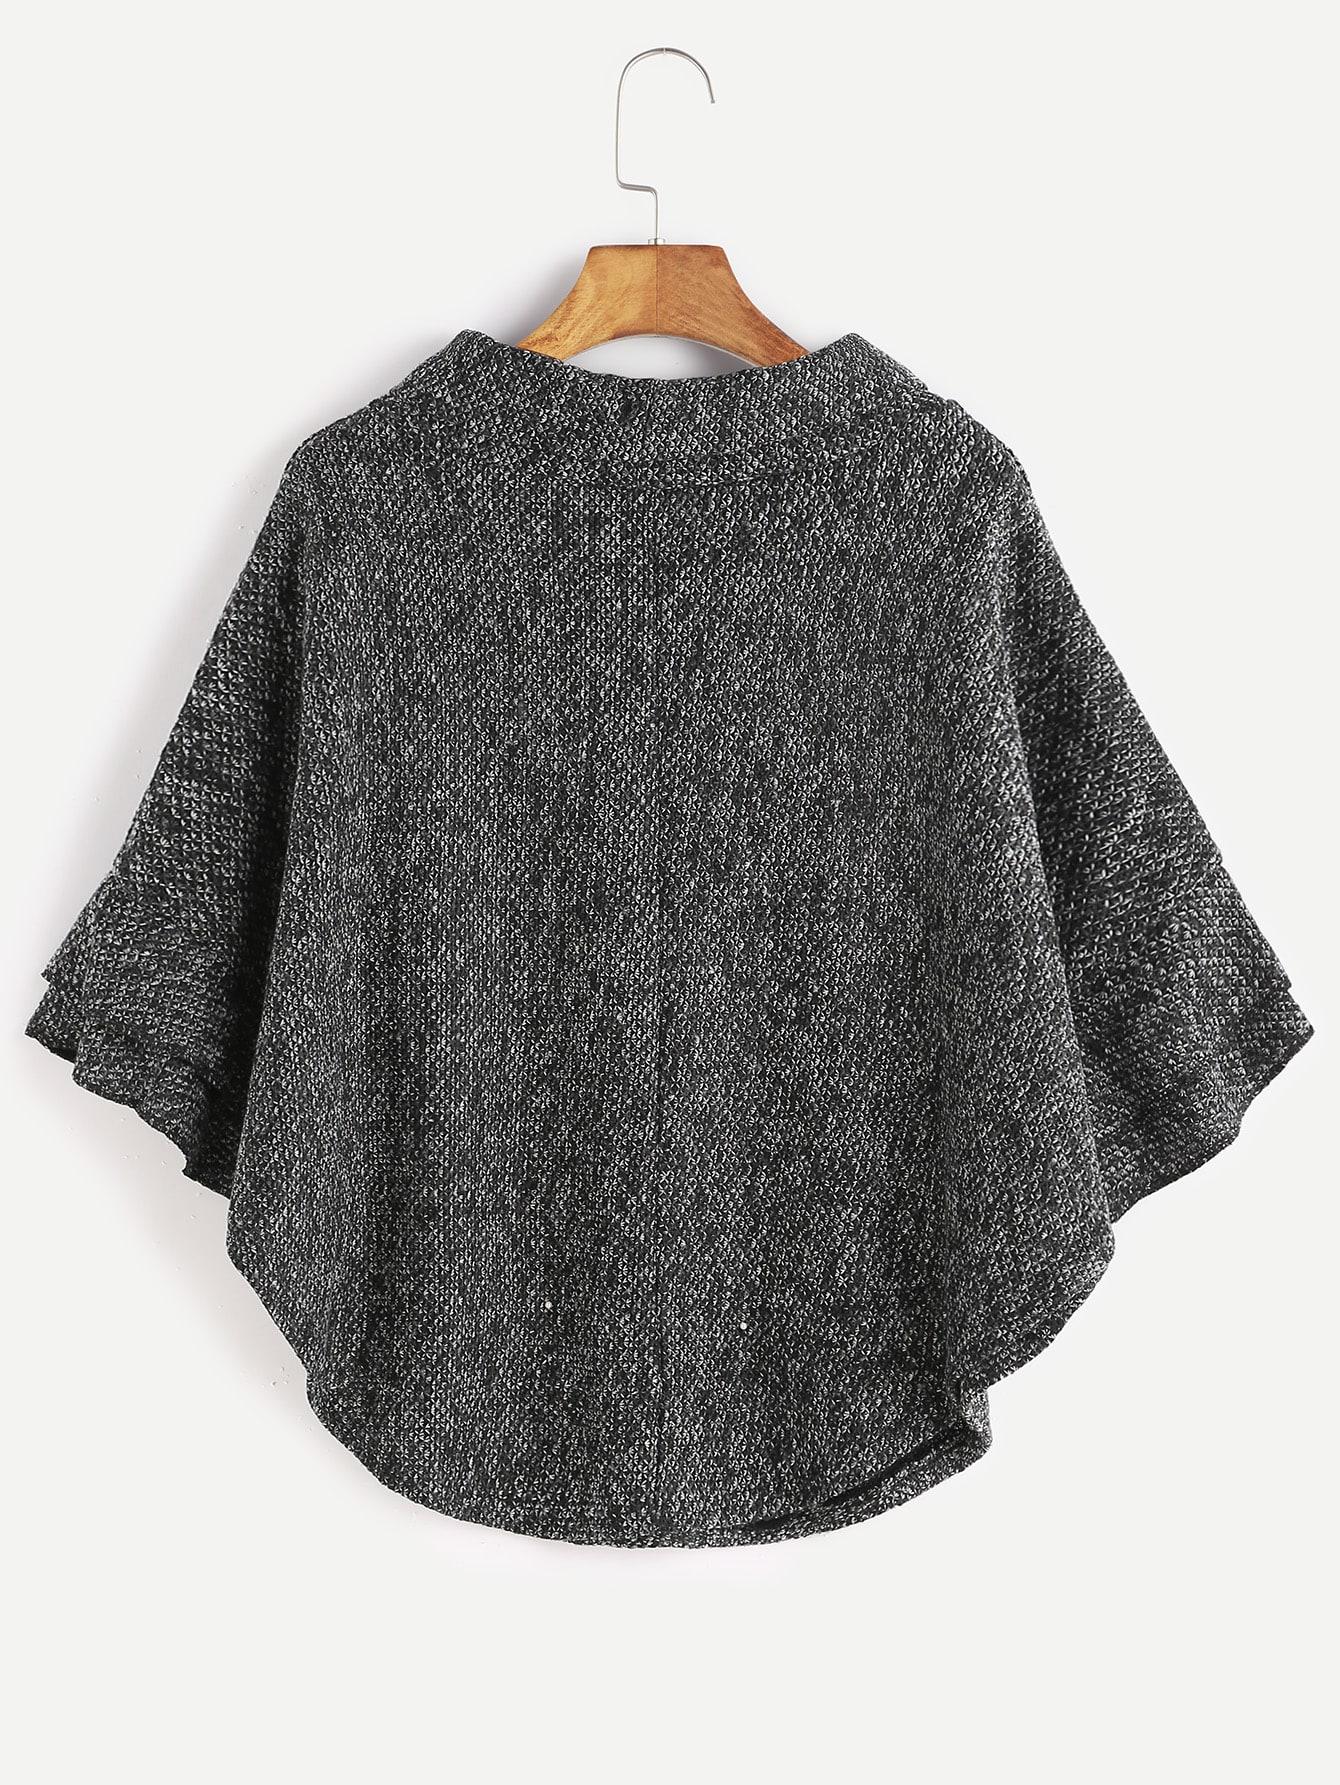 sweater161123005_2